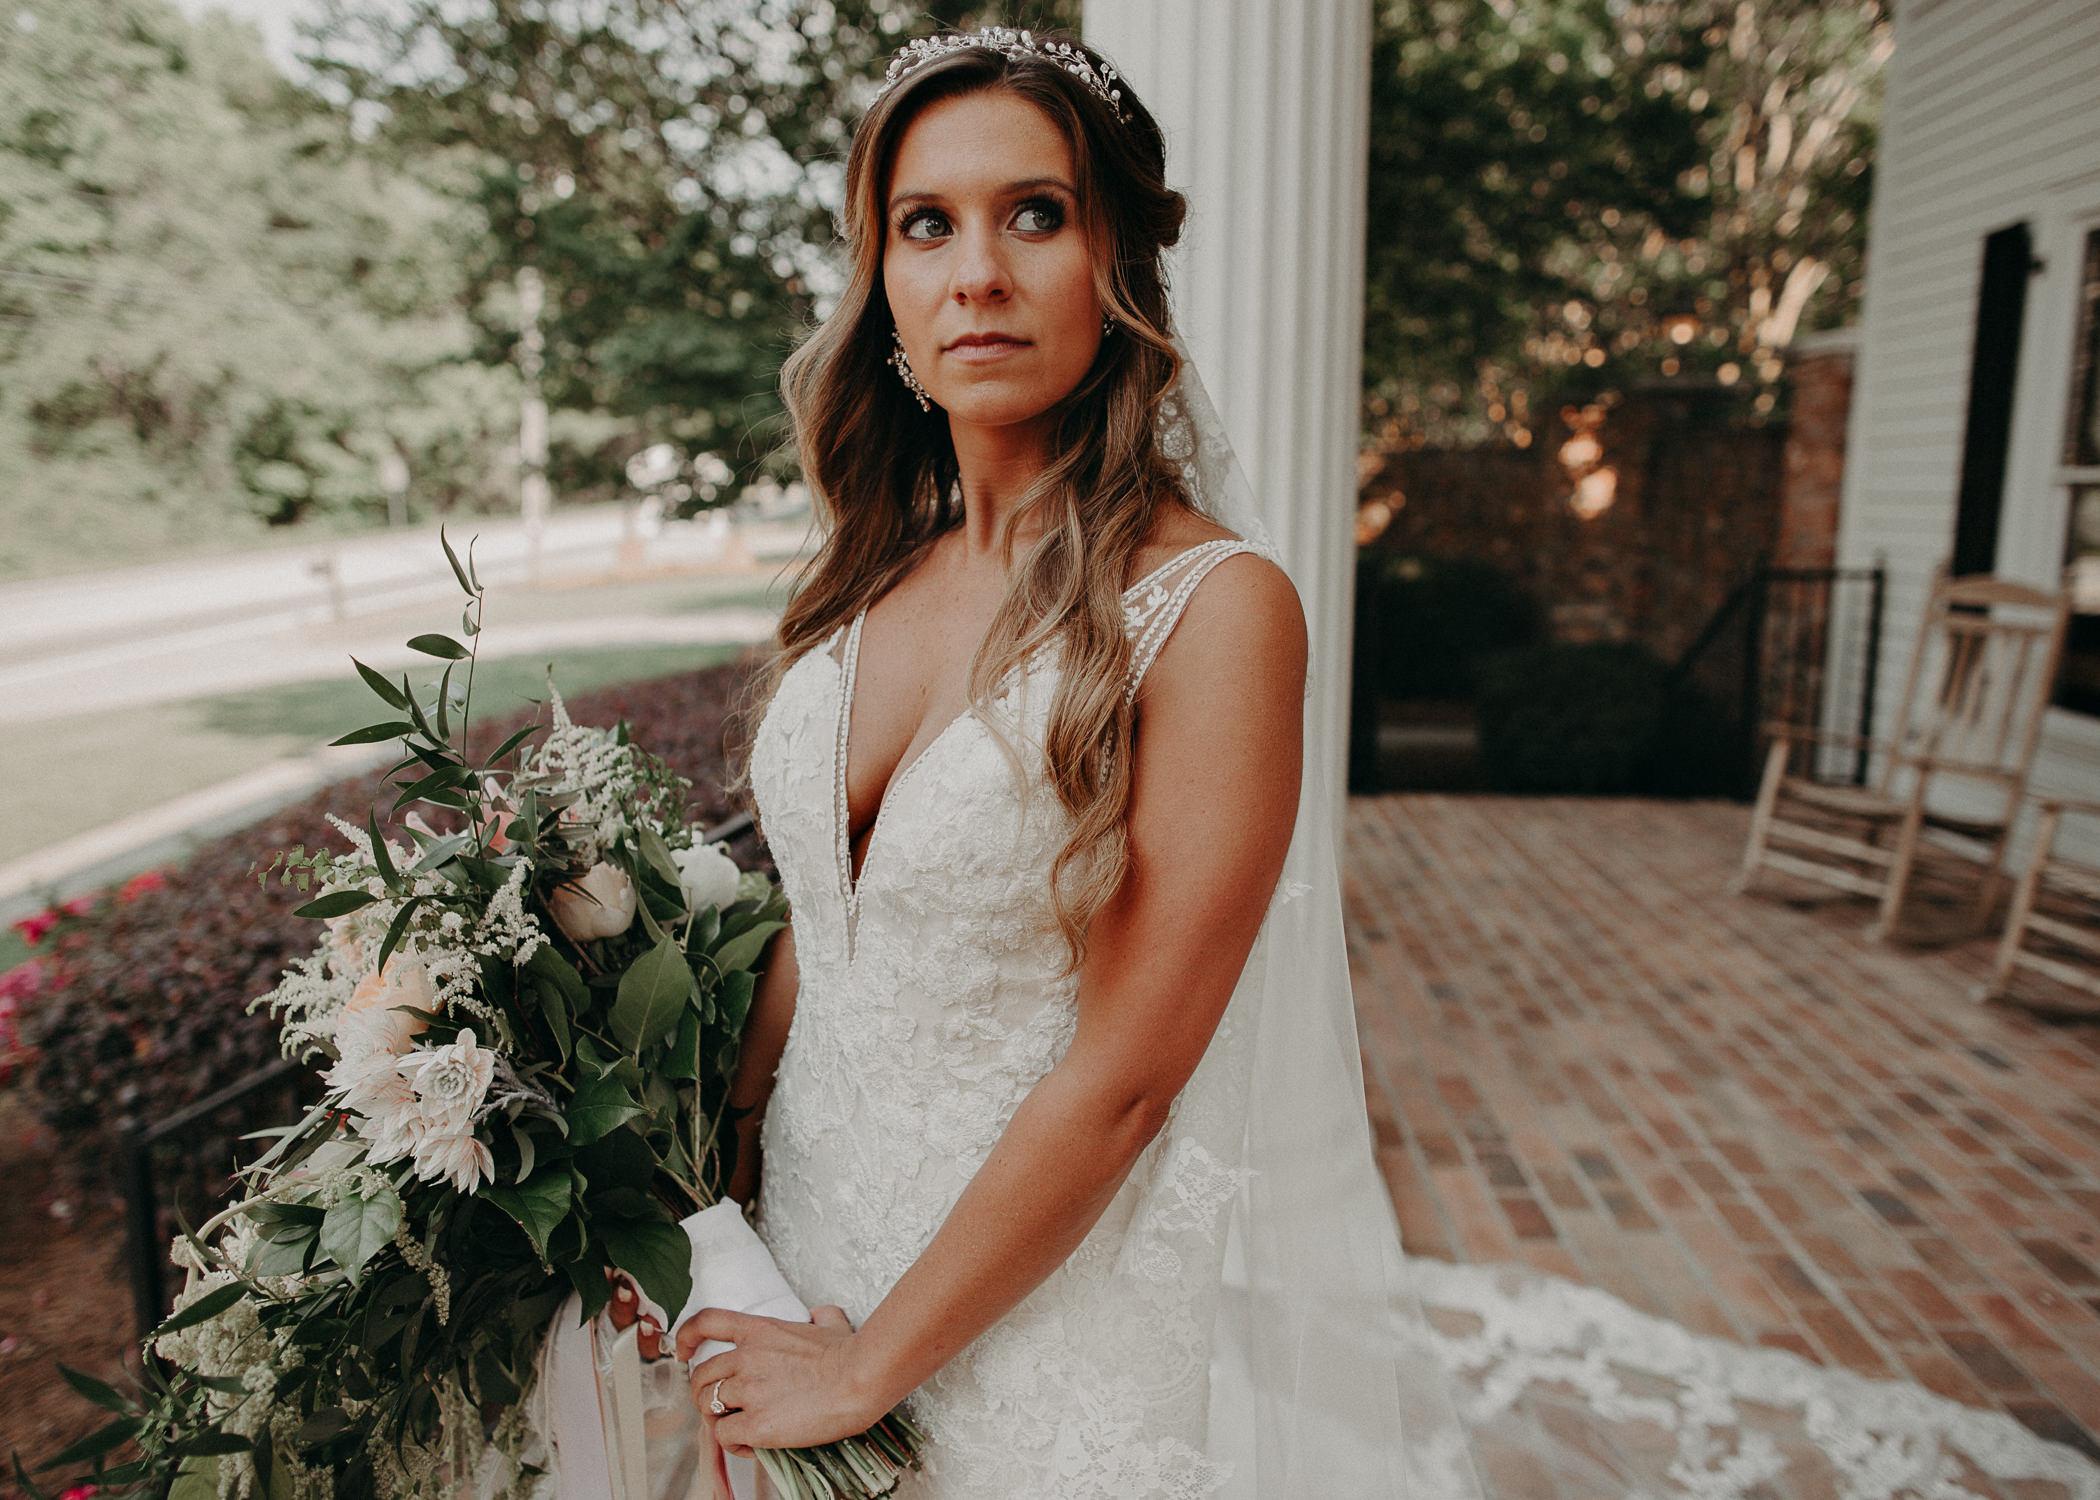 60Carl House Wedding Venue Ga, Atlanta Wedding Photographer - Boho, Bohemian, Junebug Weddings, Vintage, Retro, Trendy. Aline Marin Photography. .jpg